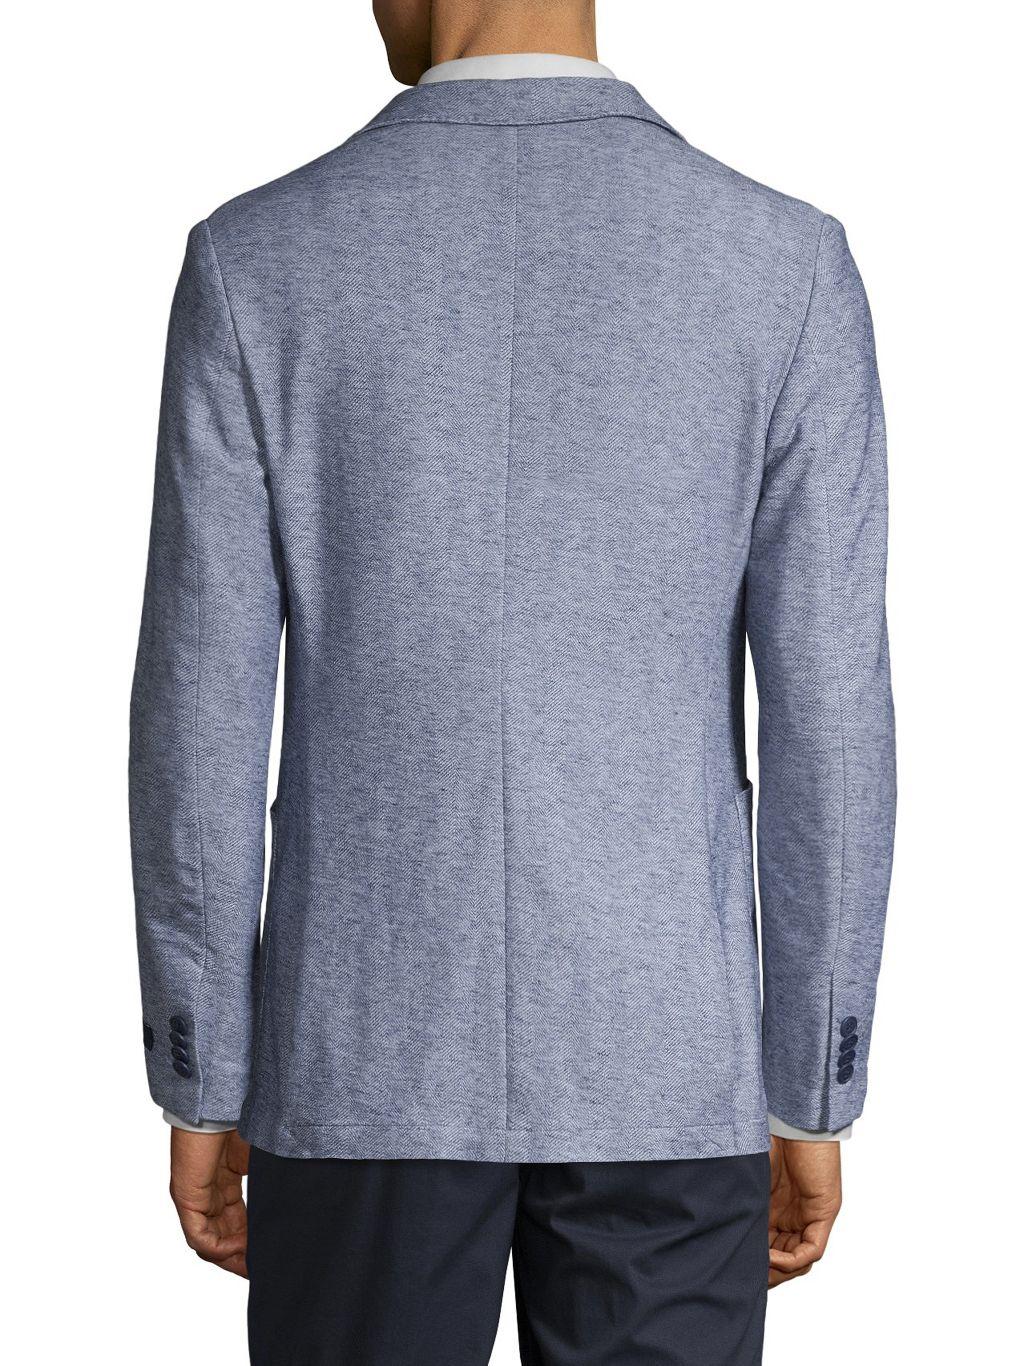 TailorByrd Herringbone Knit Sportcoat